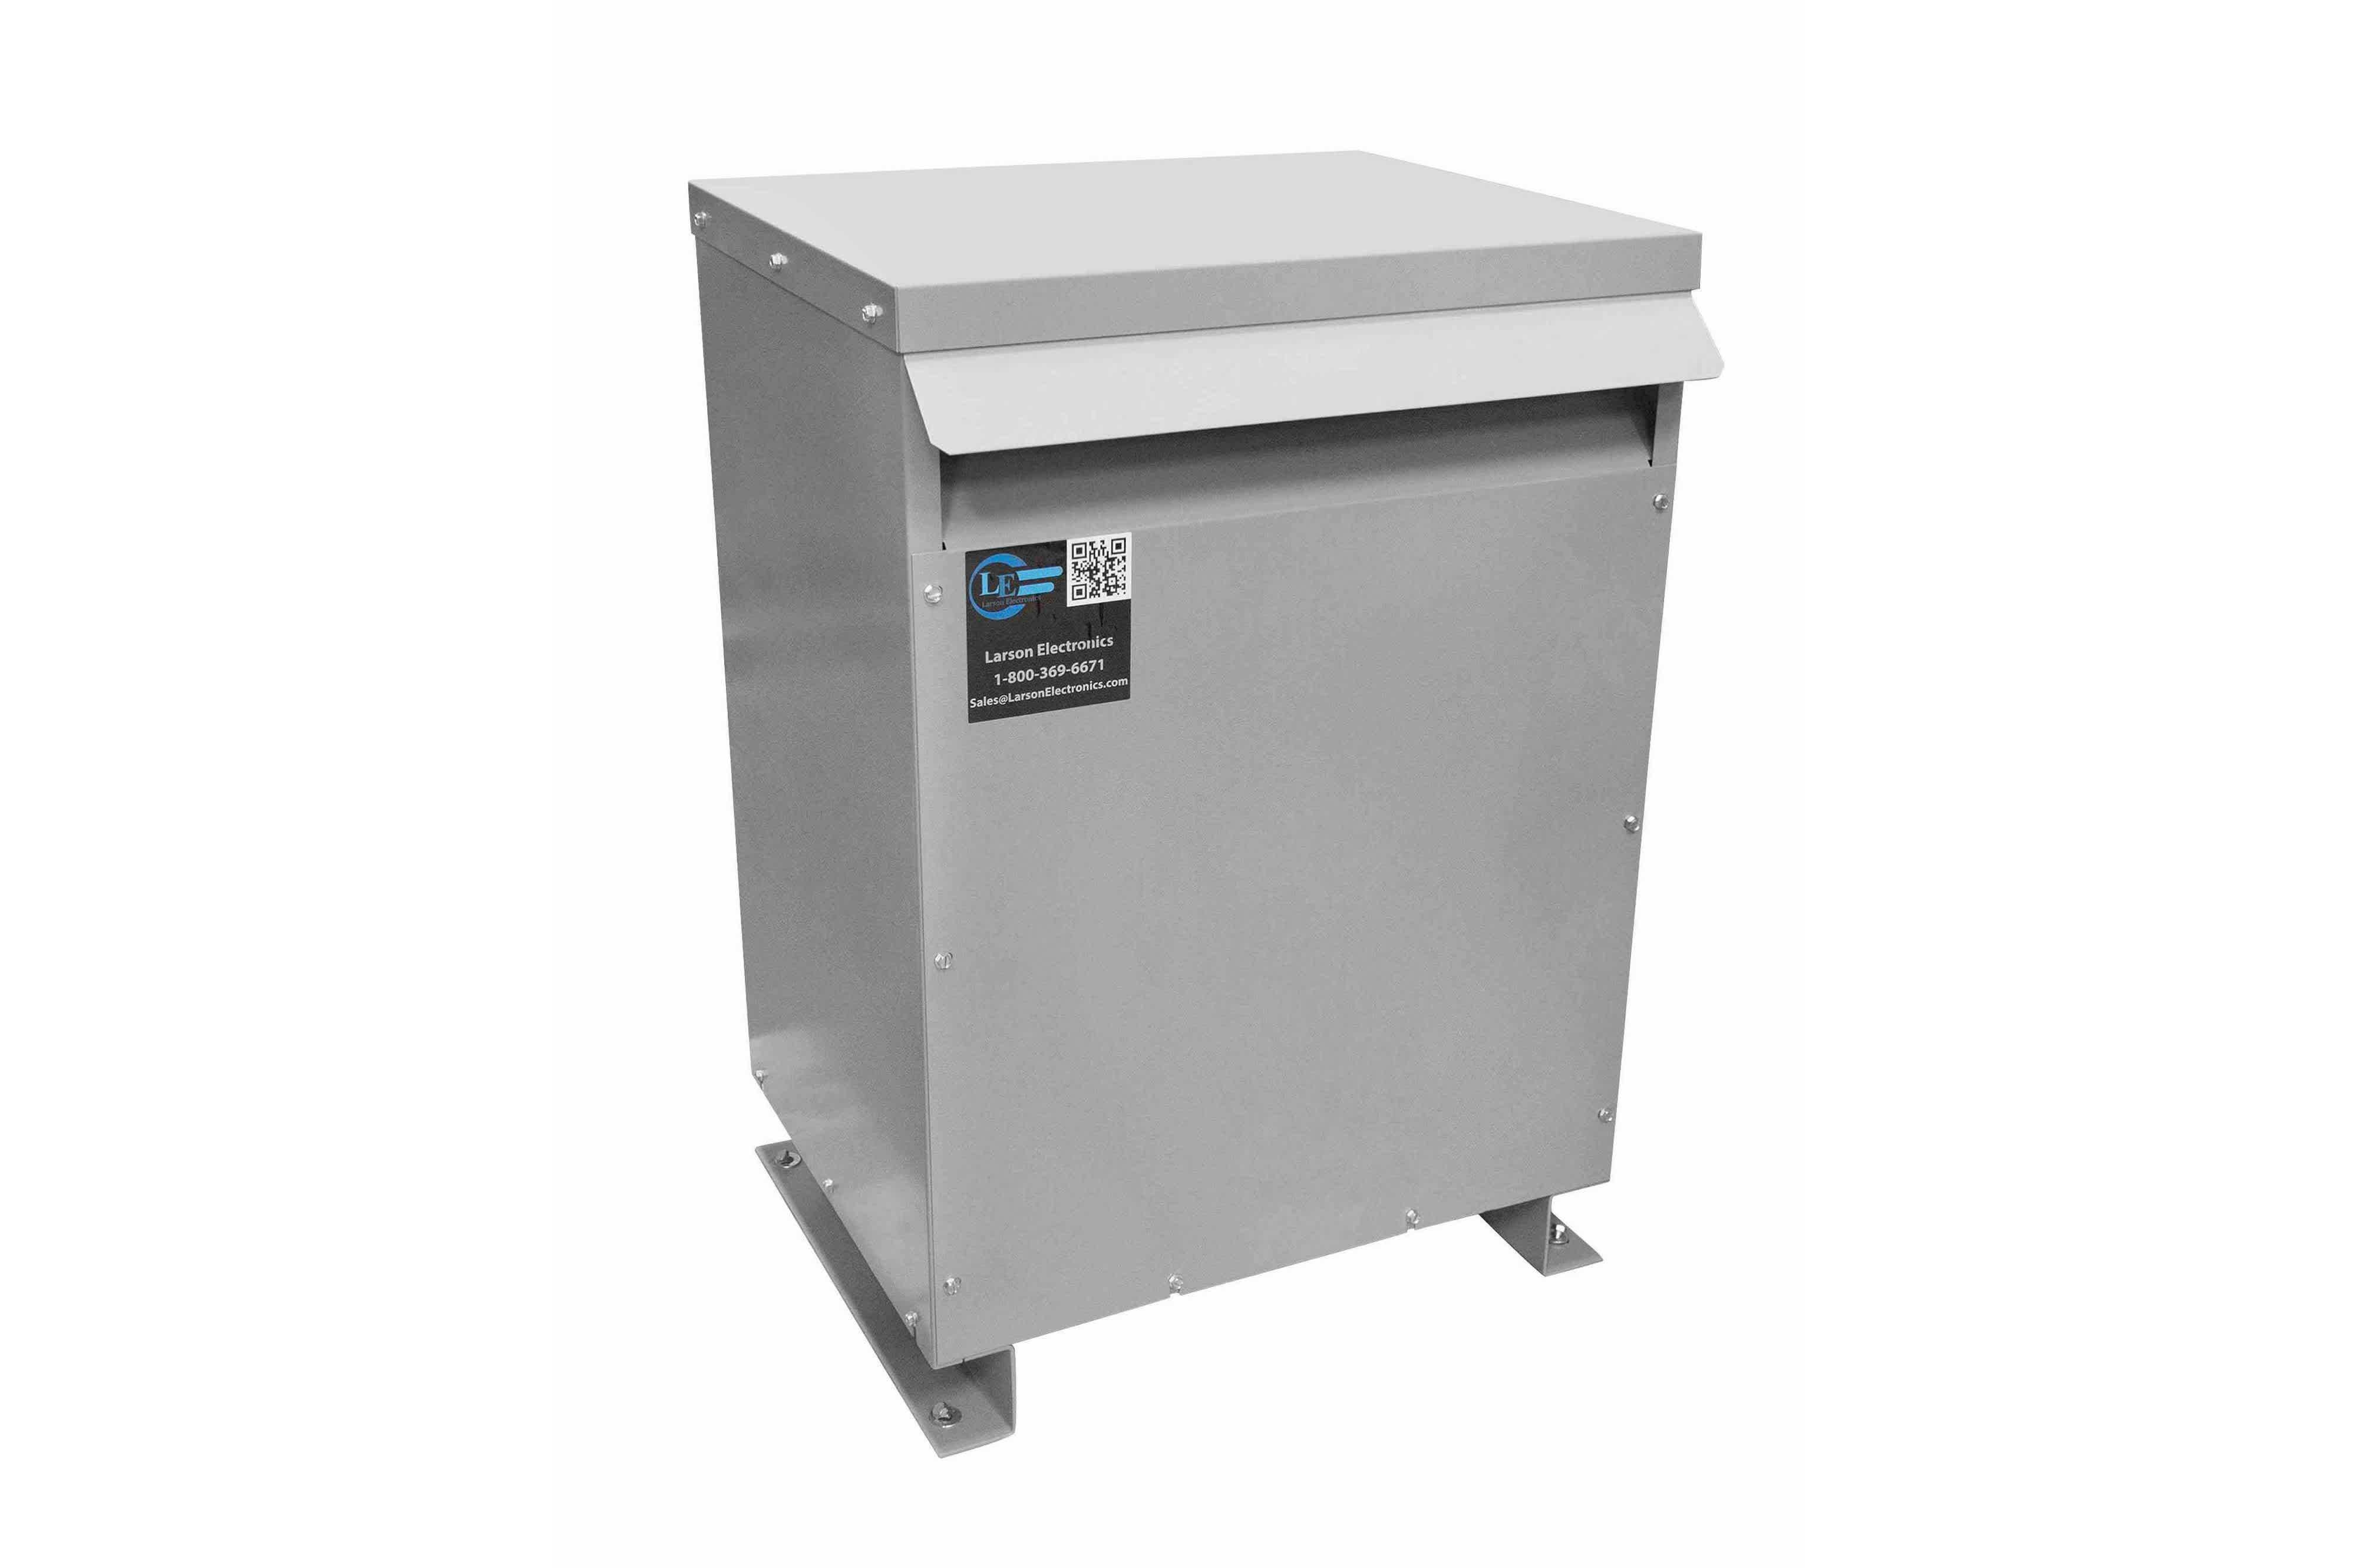 55 kVA 3PH Isolation Transformer, 600V Wye Primary, 400Y/231 Wye-N Secondary, N3R, Ventilated, 60 Hz